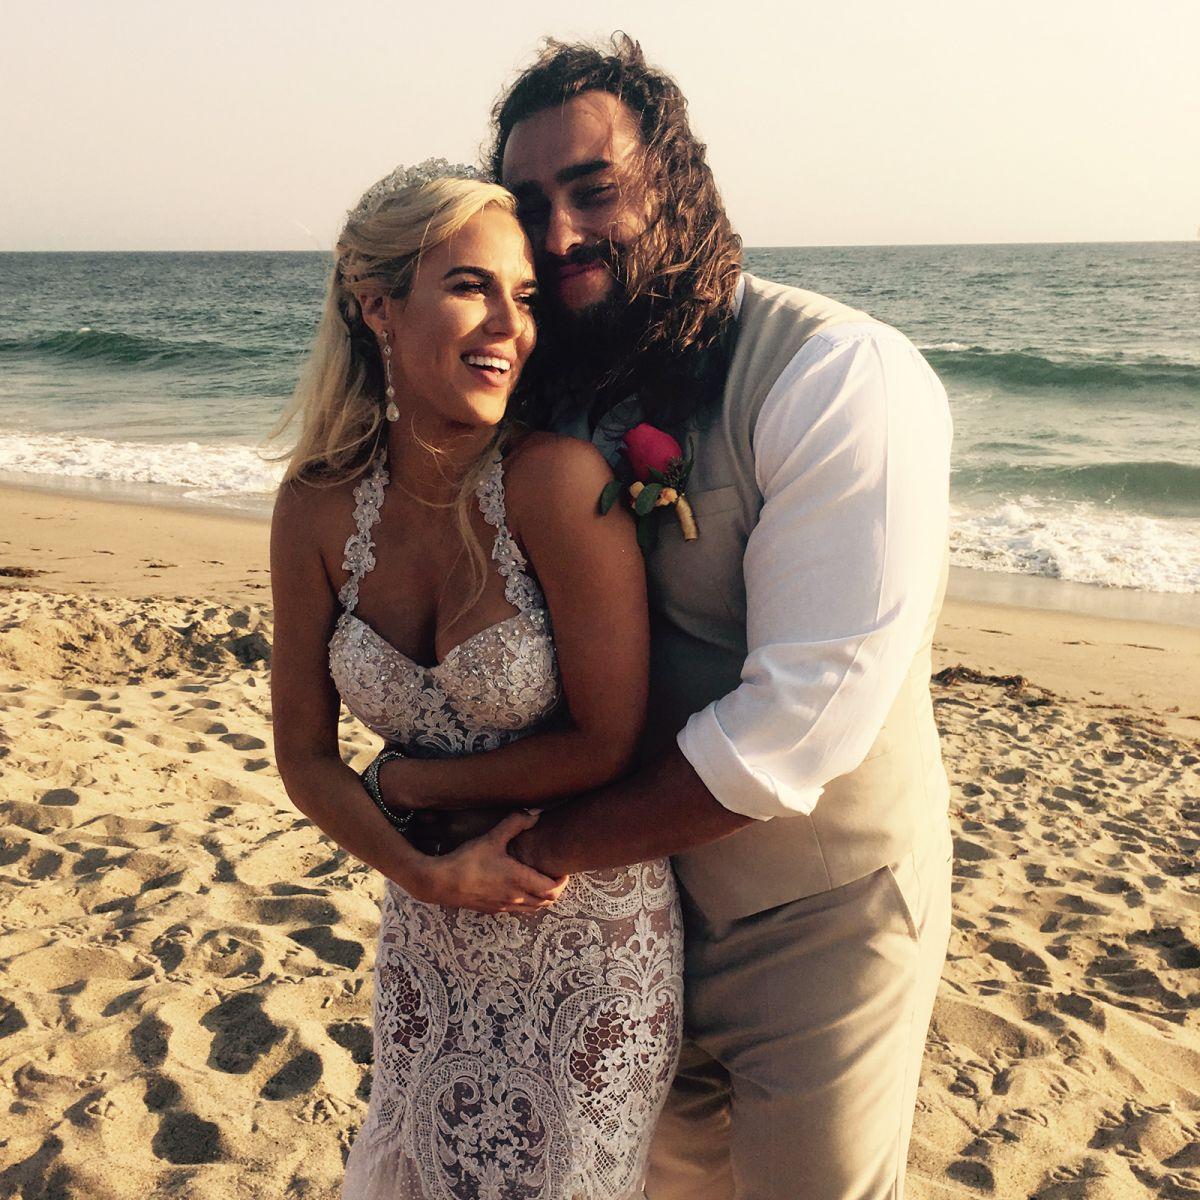 WWE - Lana and Rusev Get Married